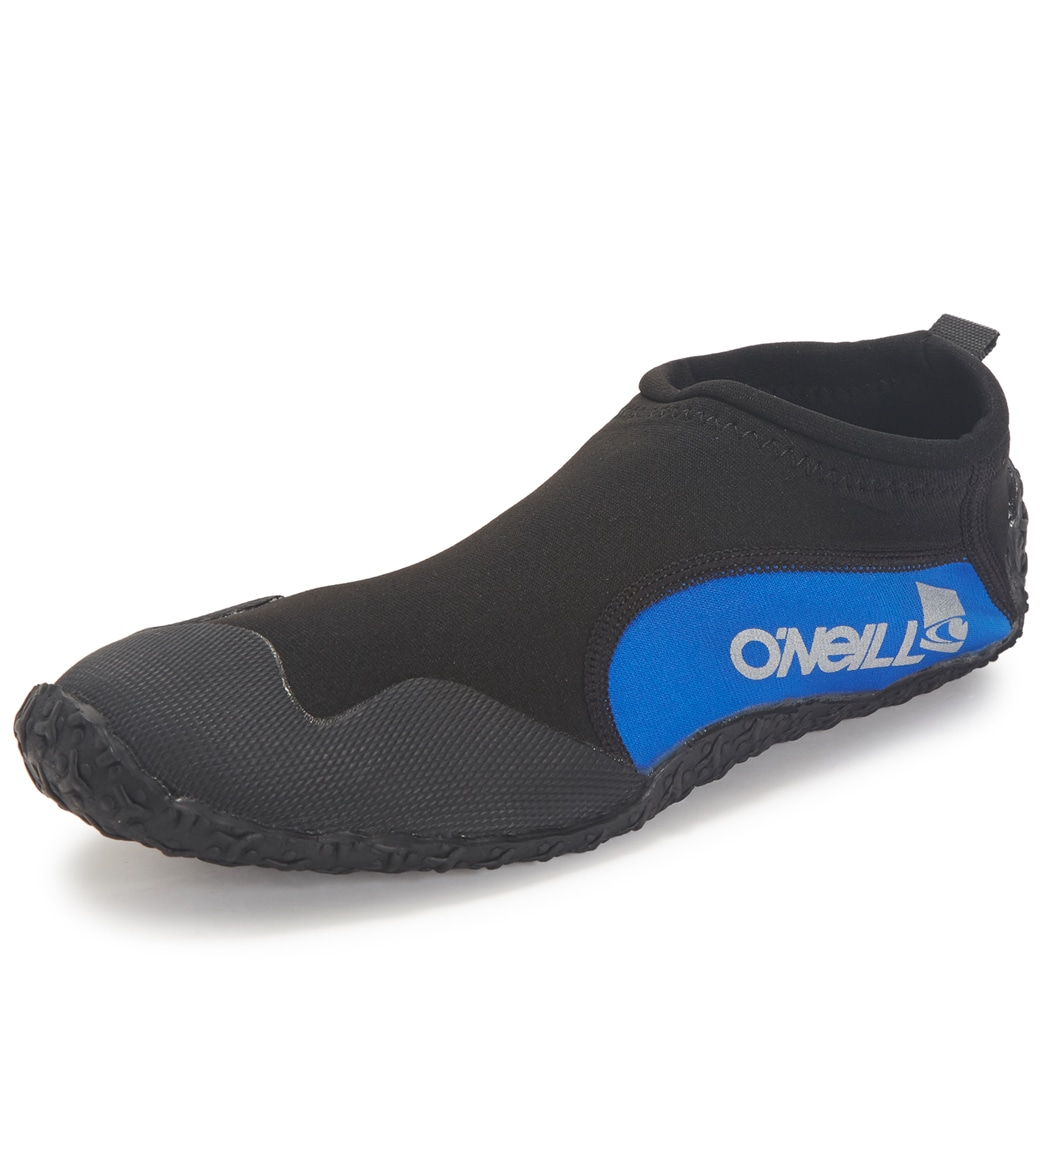 O'Neill Unisex Reactor Surf Boot at SwimOutlet.com